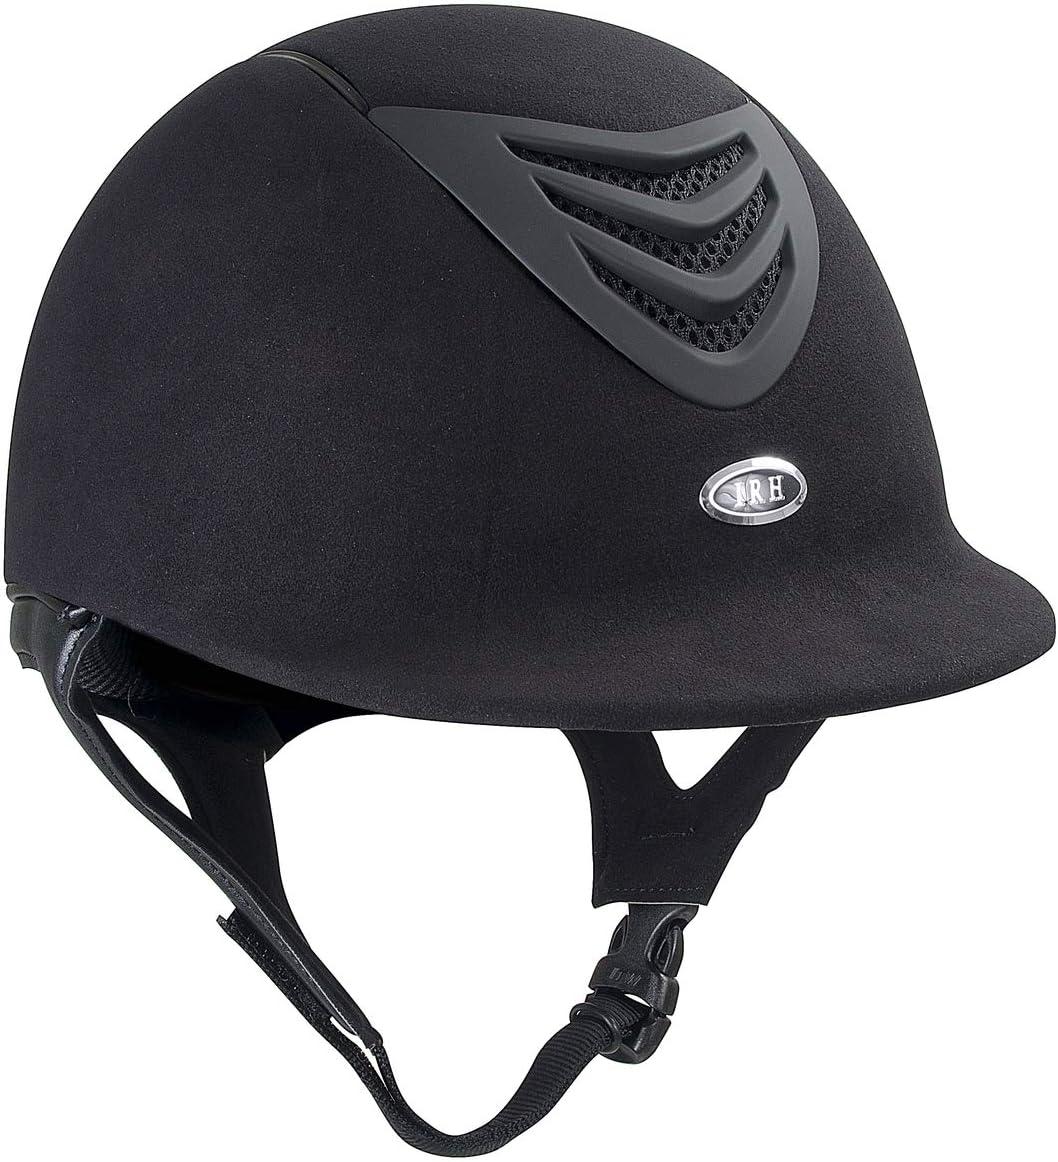 IRH 4G Helmet with Interchangable Comfort/Sizing Liners : Sports & Outdoors